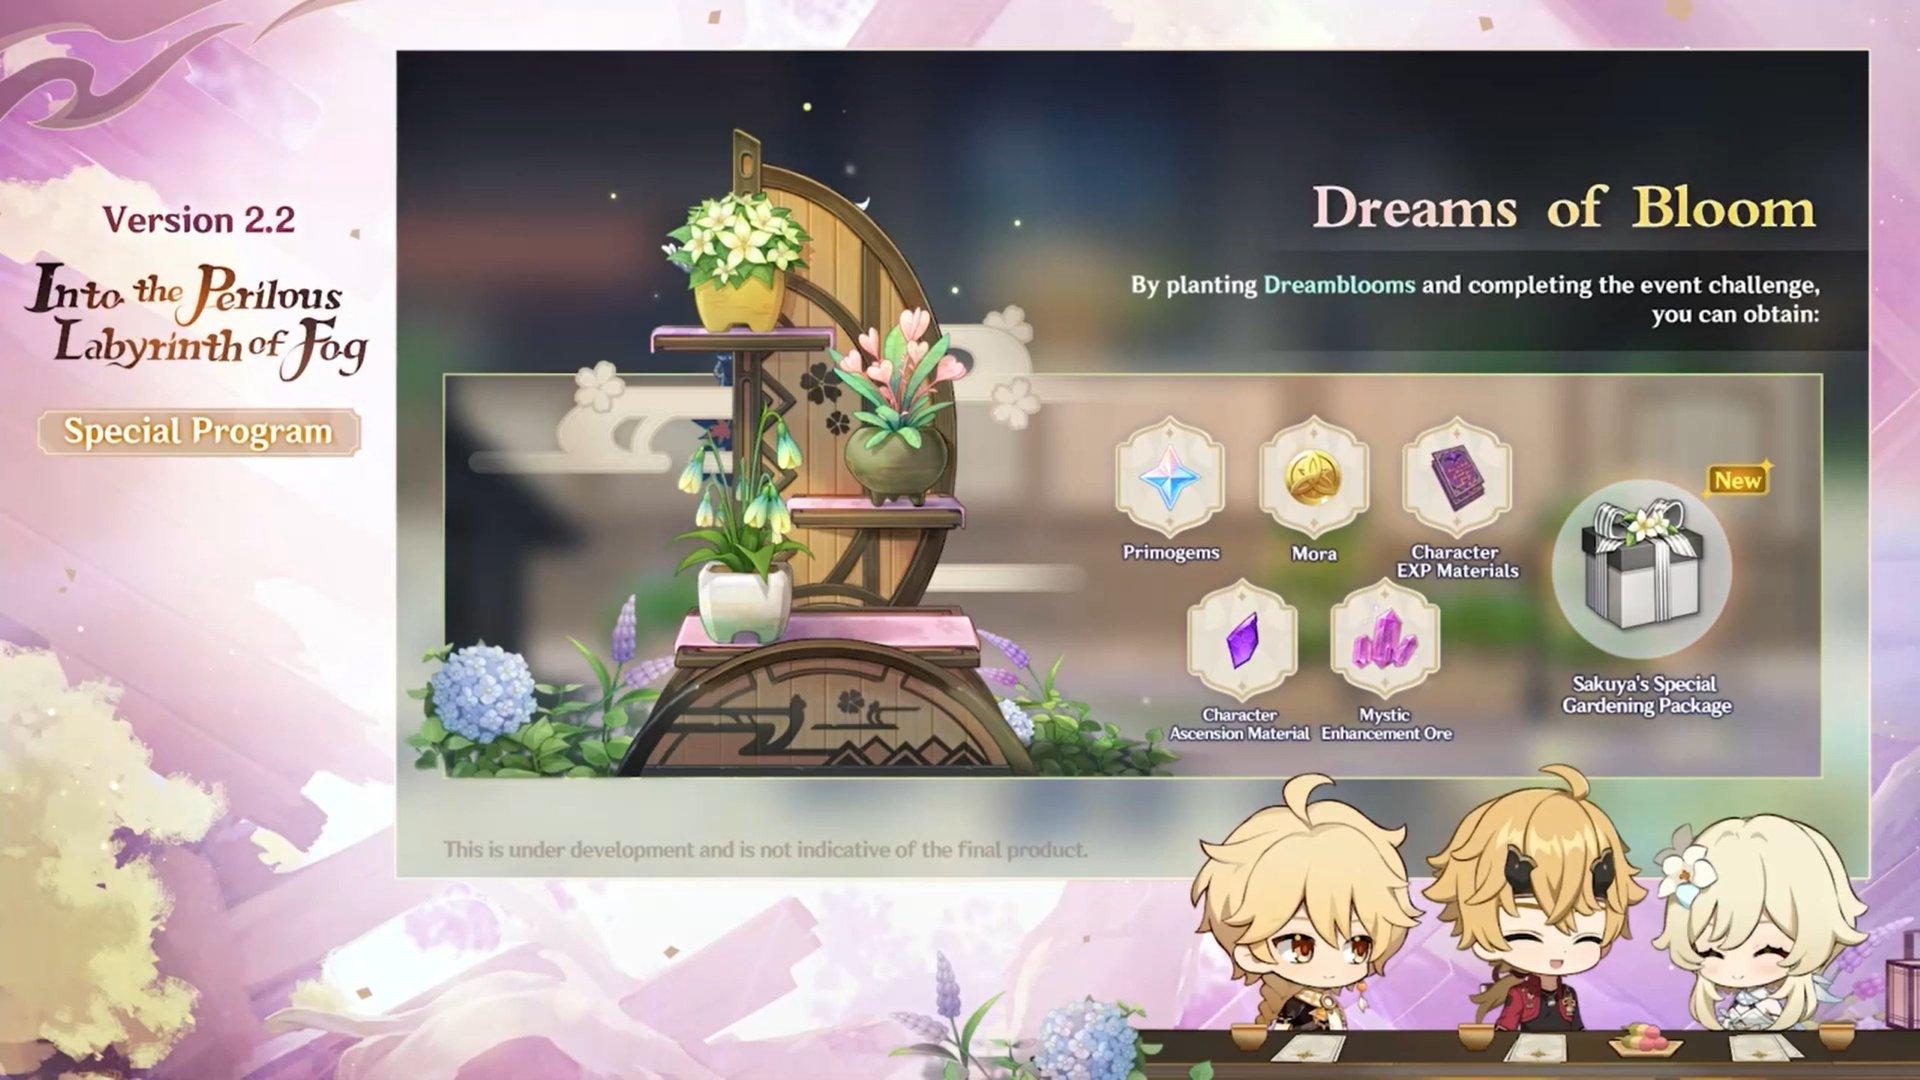 Genshin Impact 2.2 - Dreams of Bloom